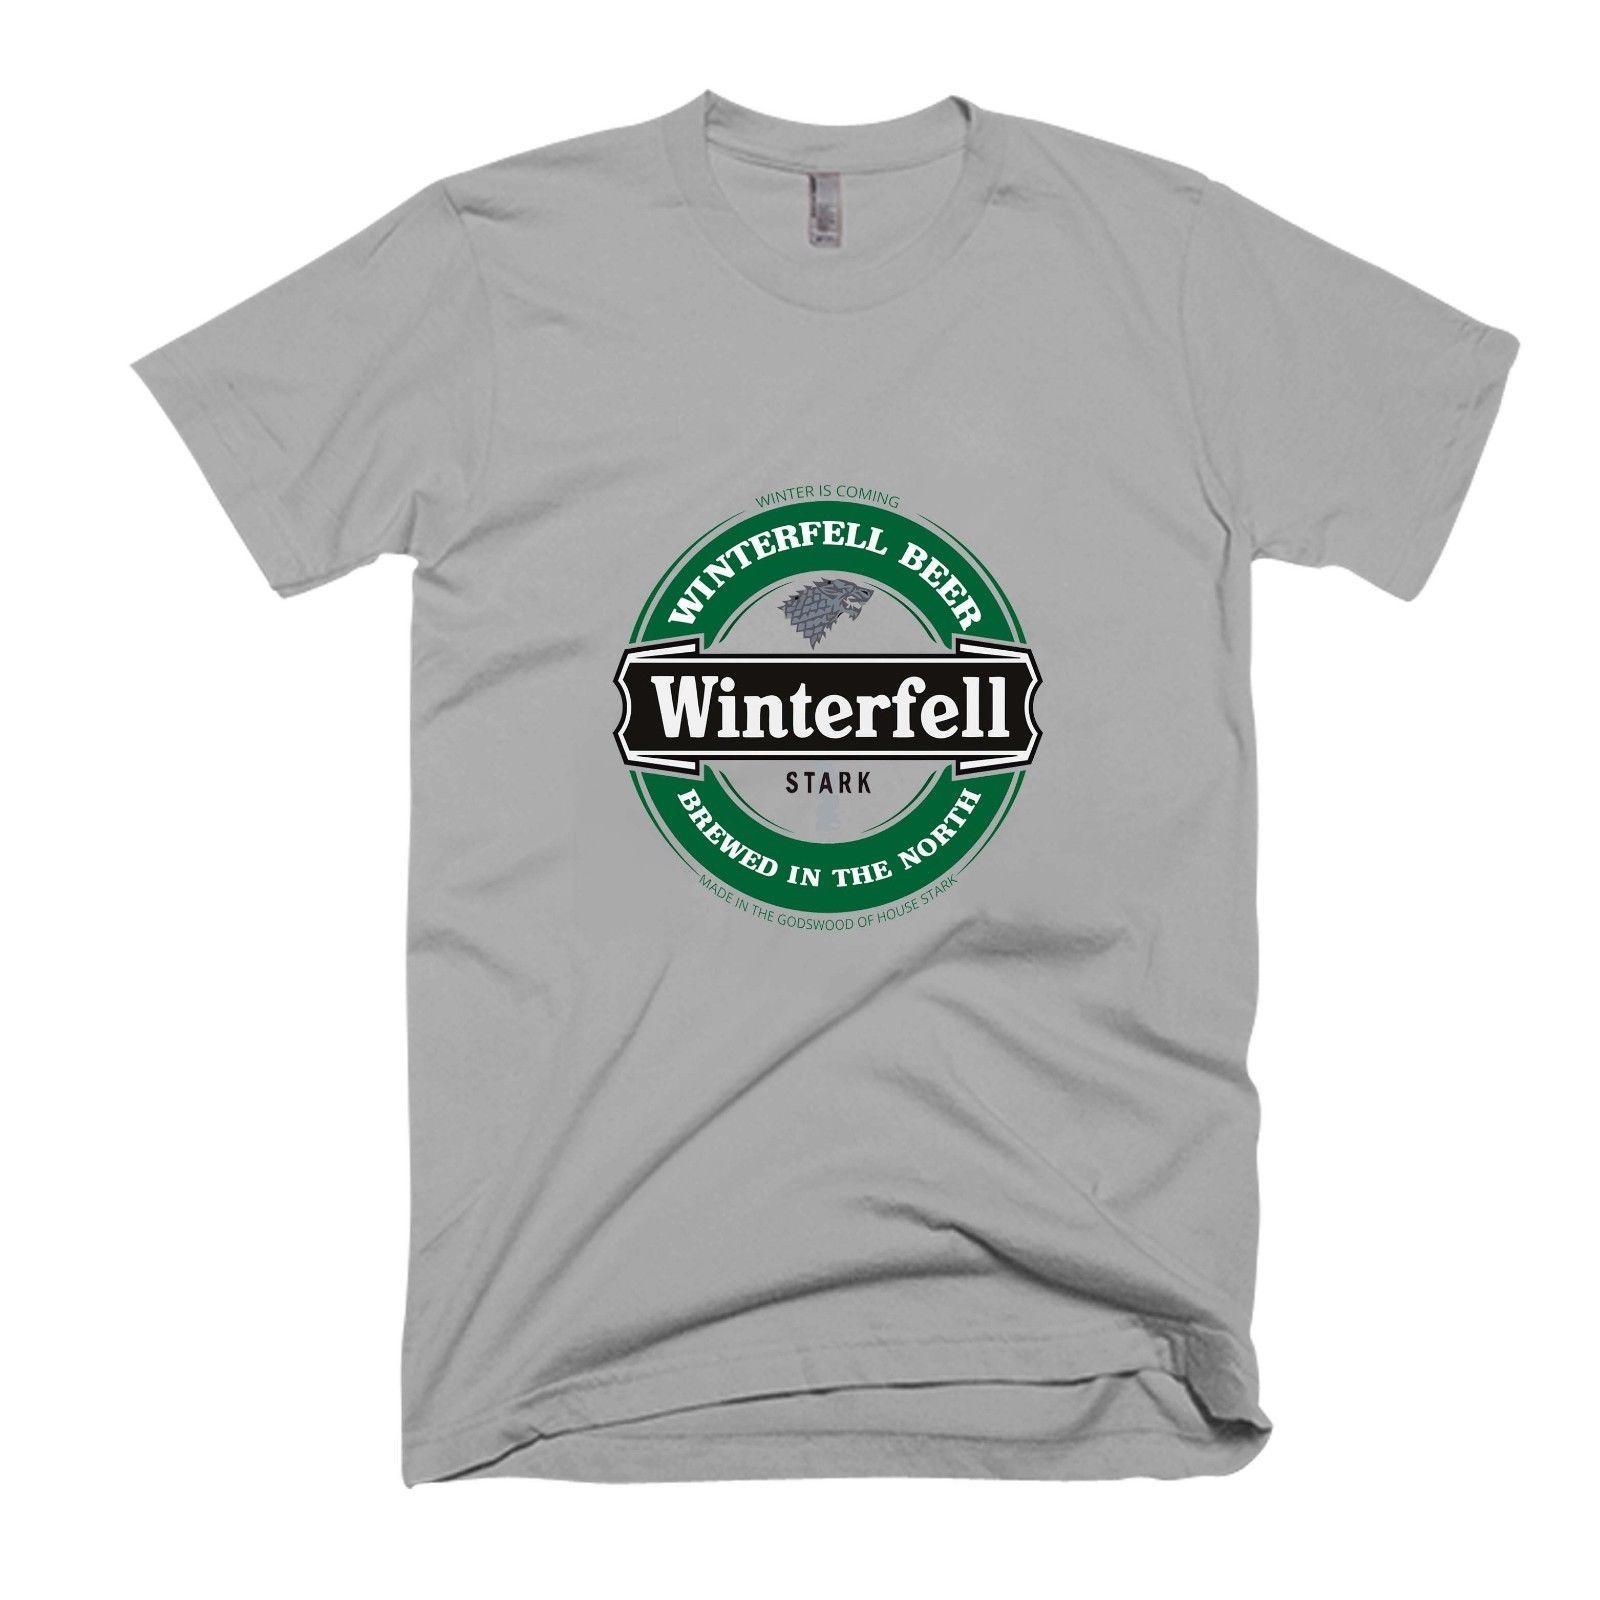 a0f0336cf1281 Winterfell Beer T-shirt homme / femme rigolo t-shirt 100% coton harajuku  T-shirt Eté 2018